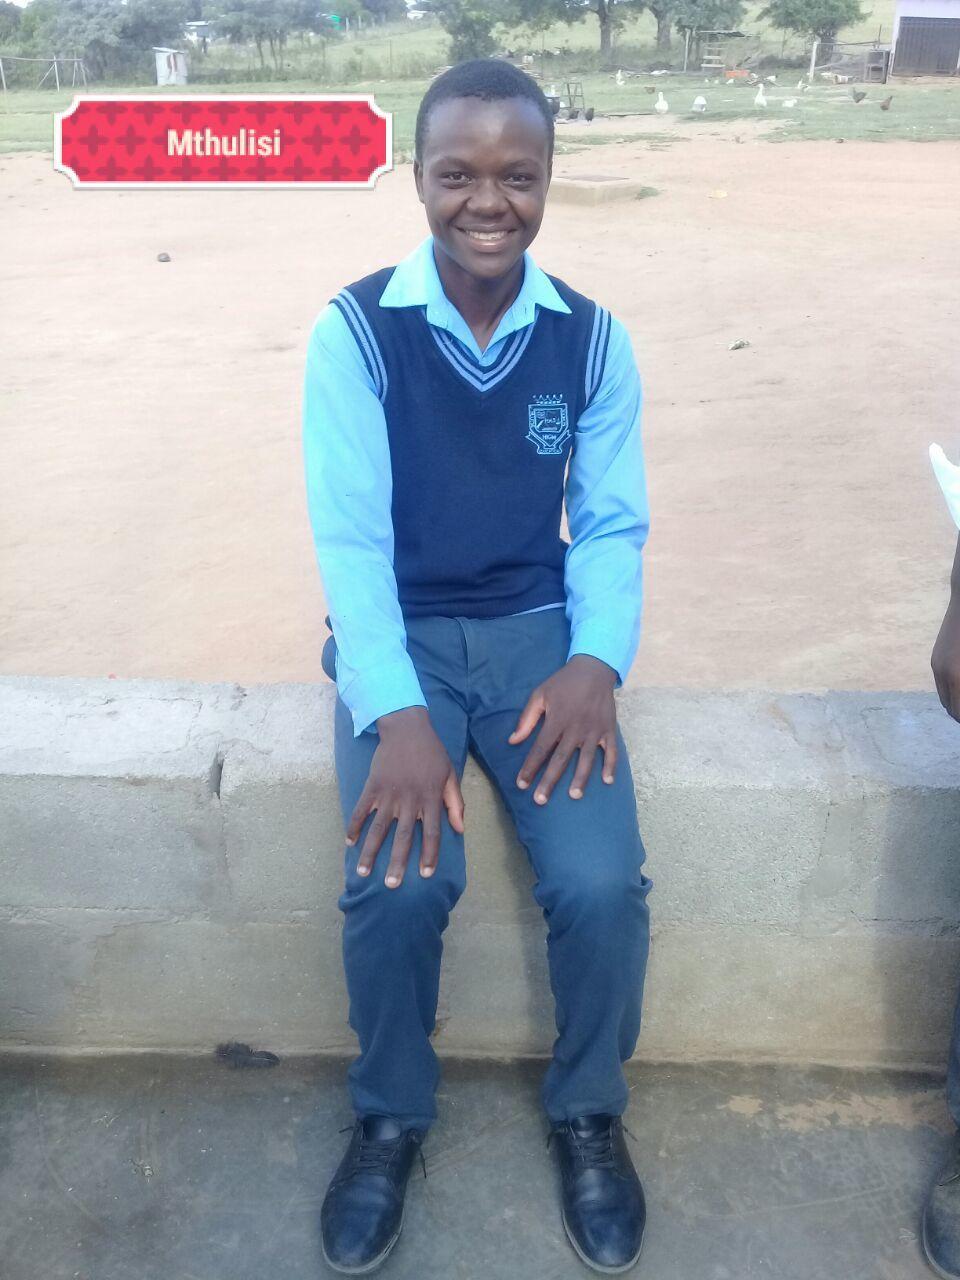 Mthulisi